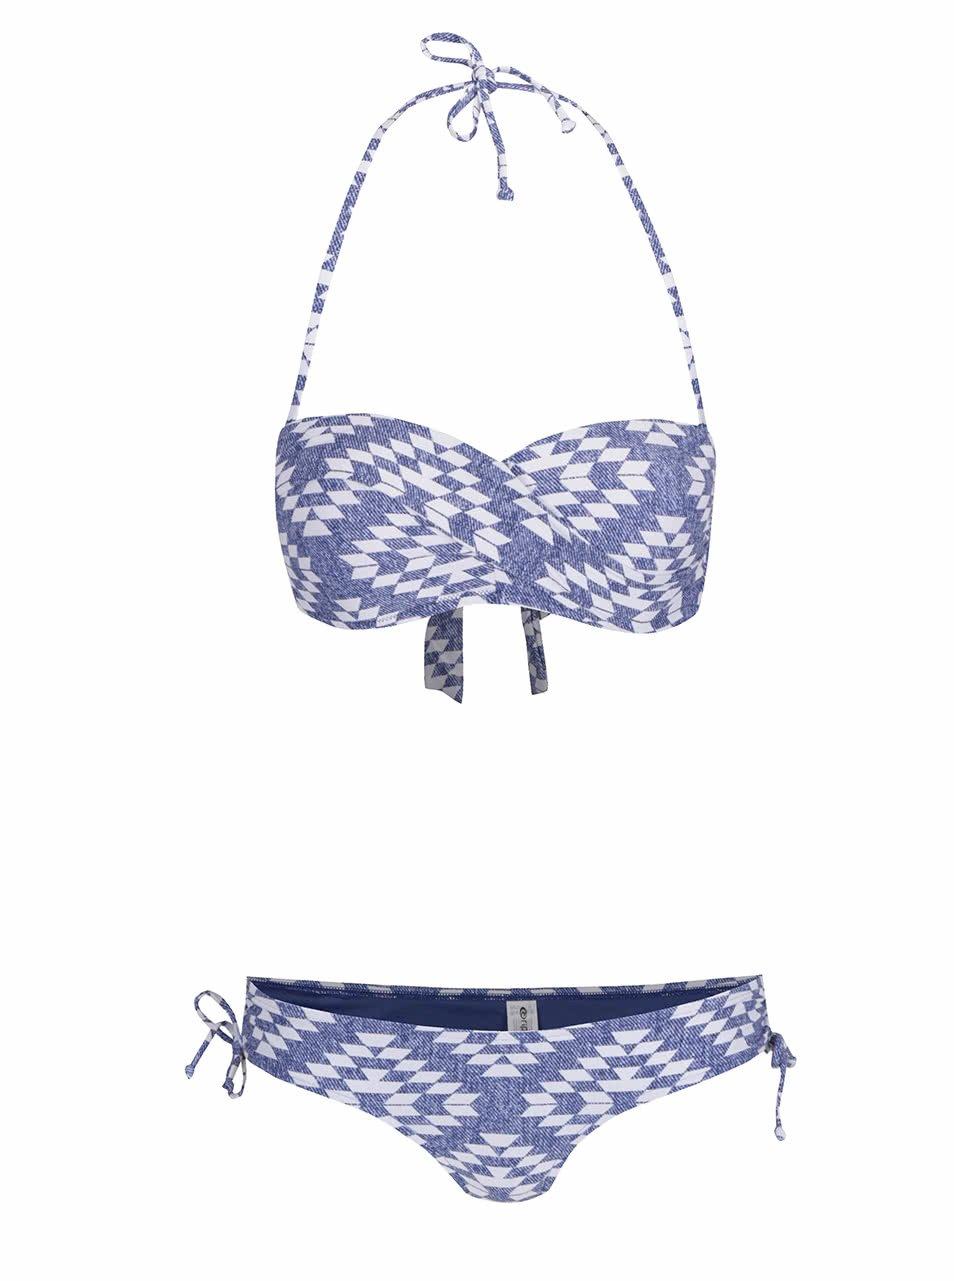 Bílo-modré dámské dvoudílné plavky Rip Curl Del Sol